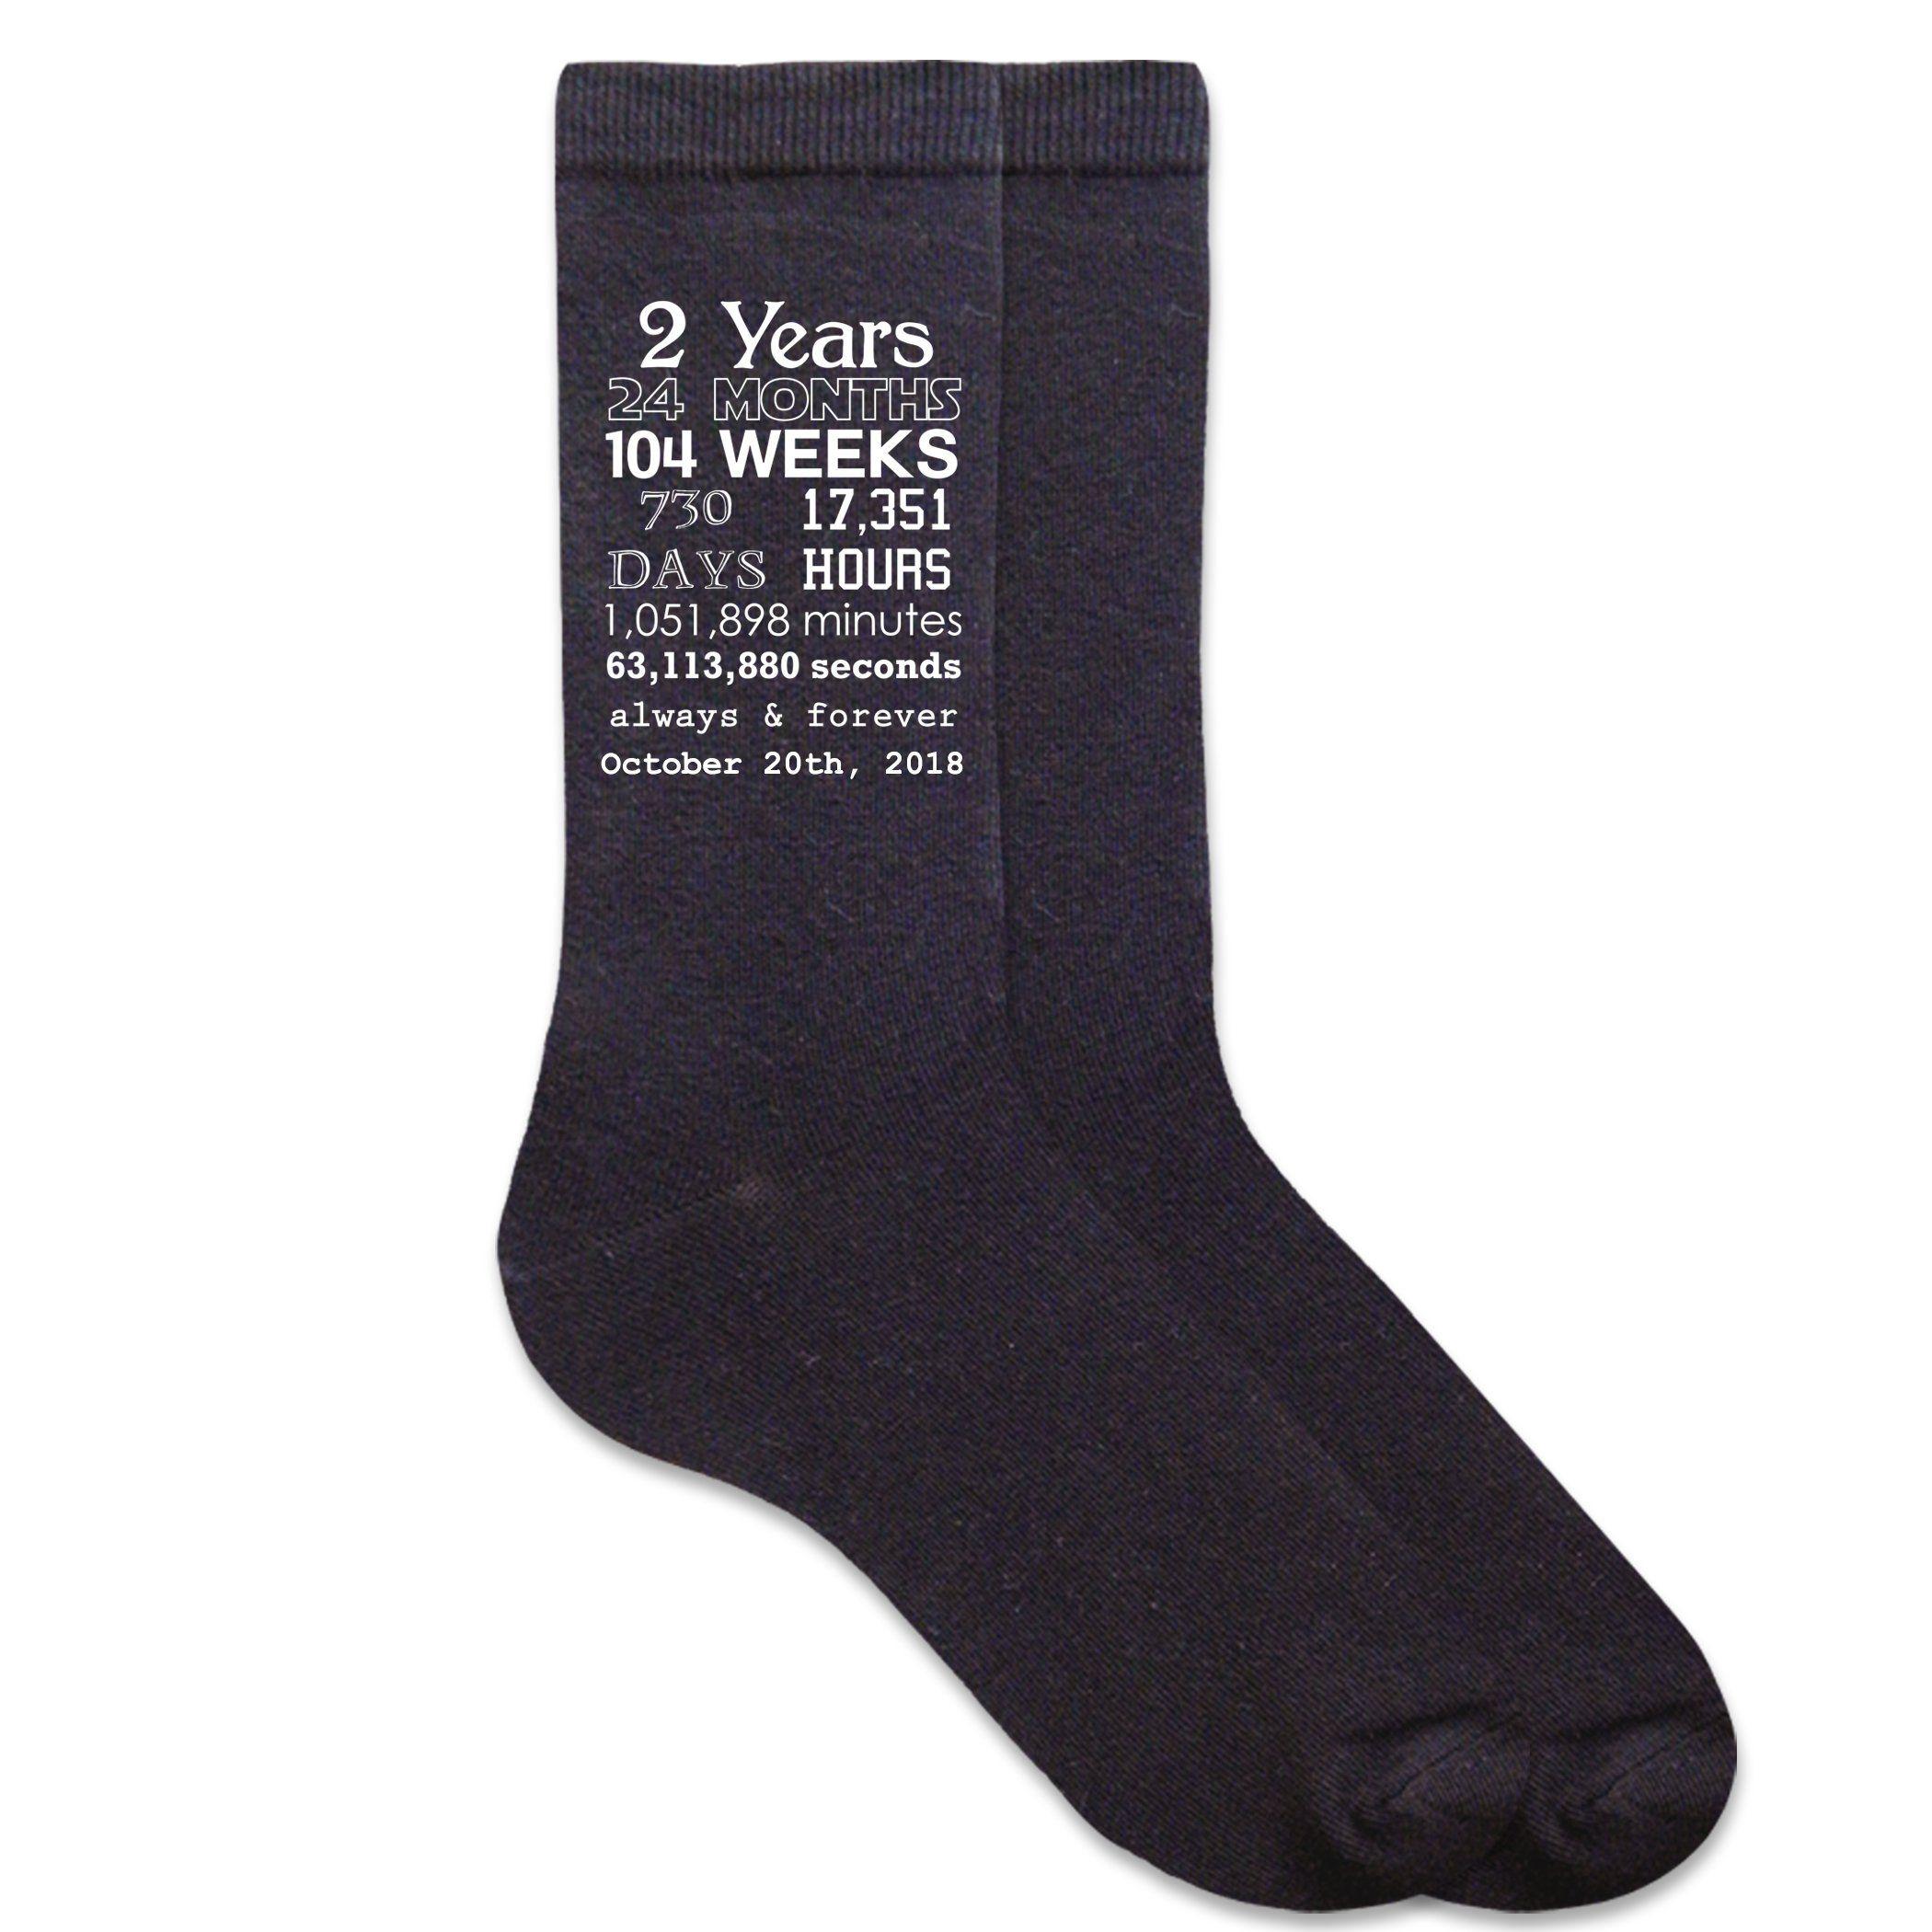 2nd Wedding Anniversary Gifts For Men: 2nd Anniversary Men's Dress Socks